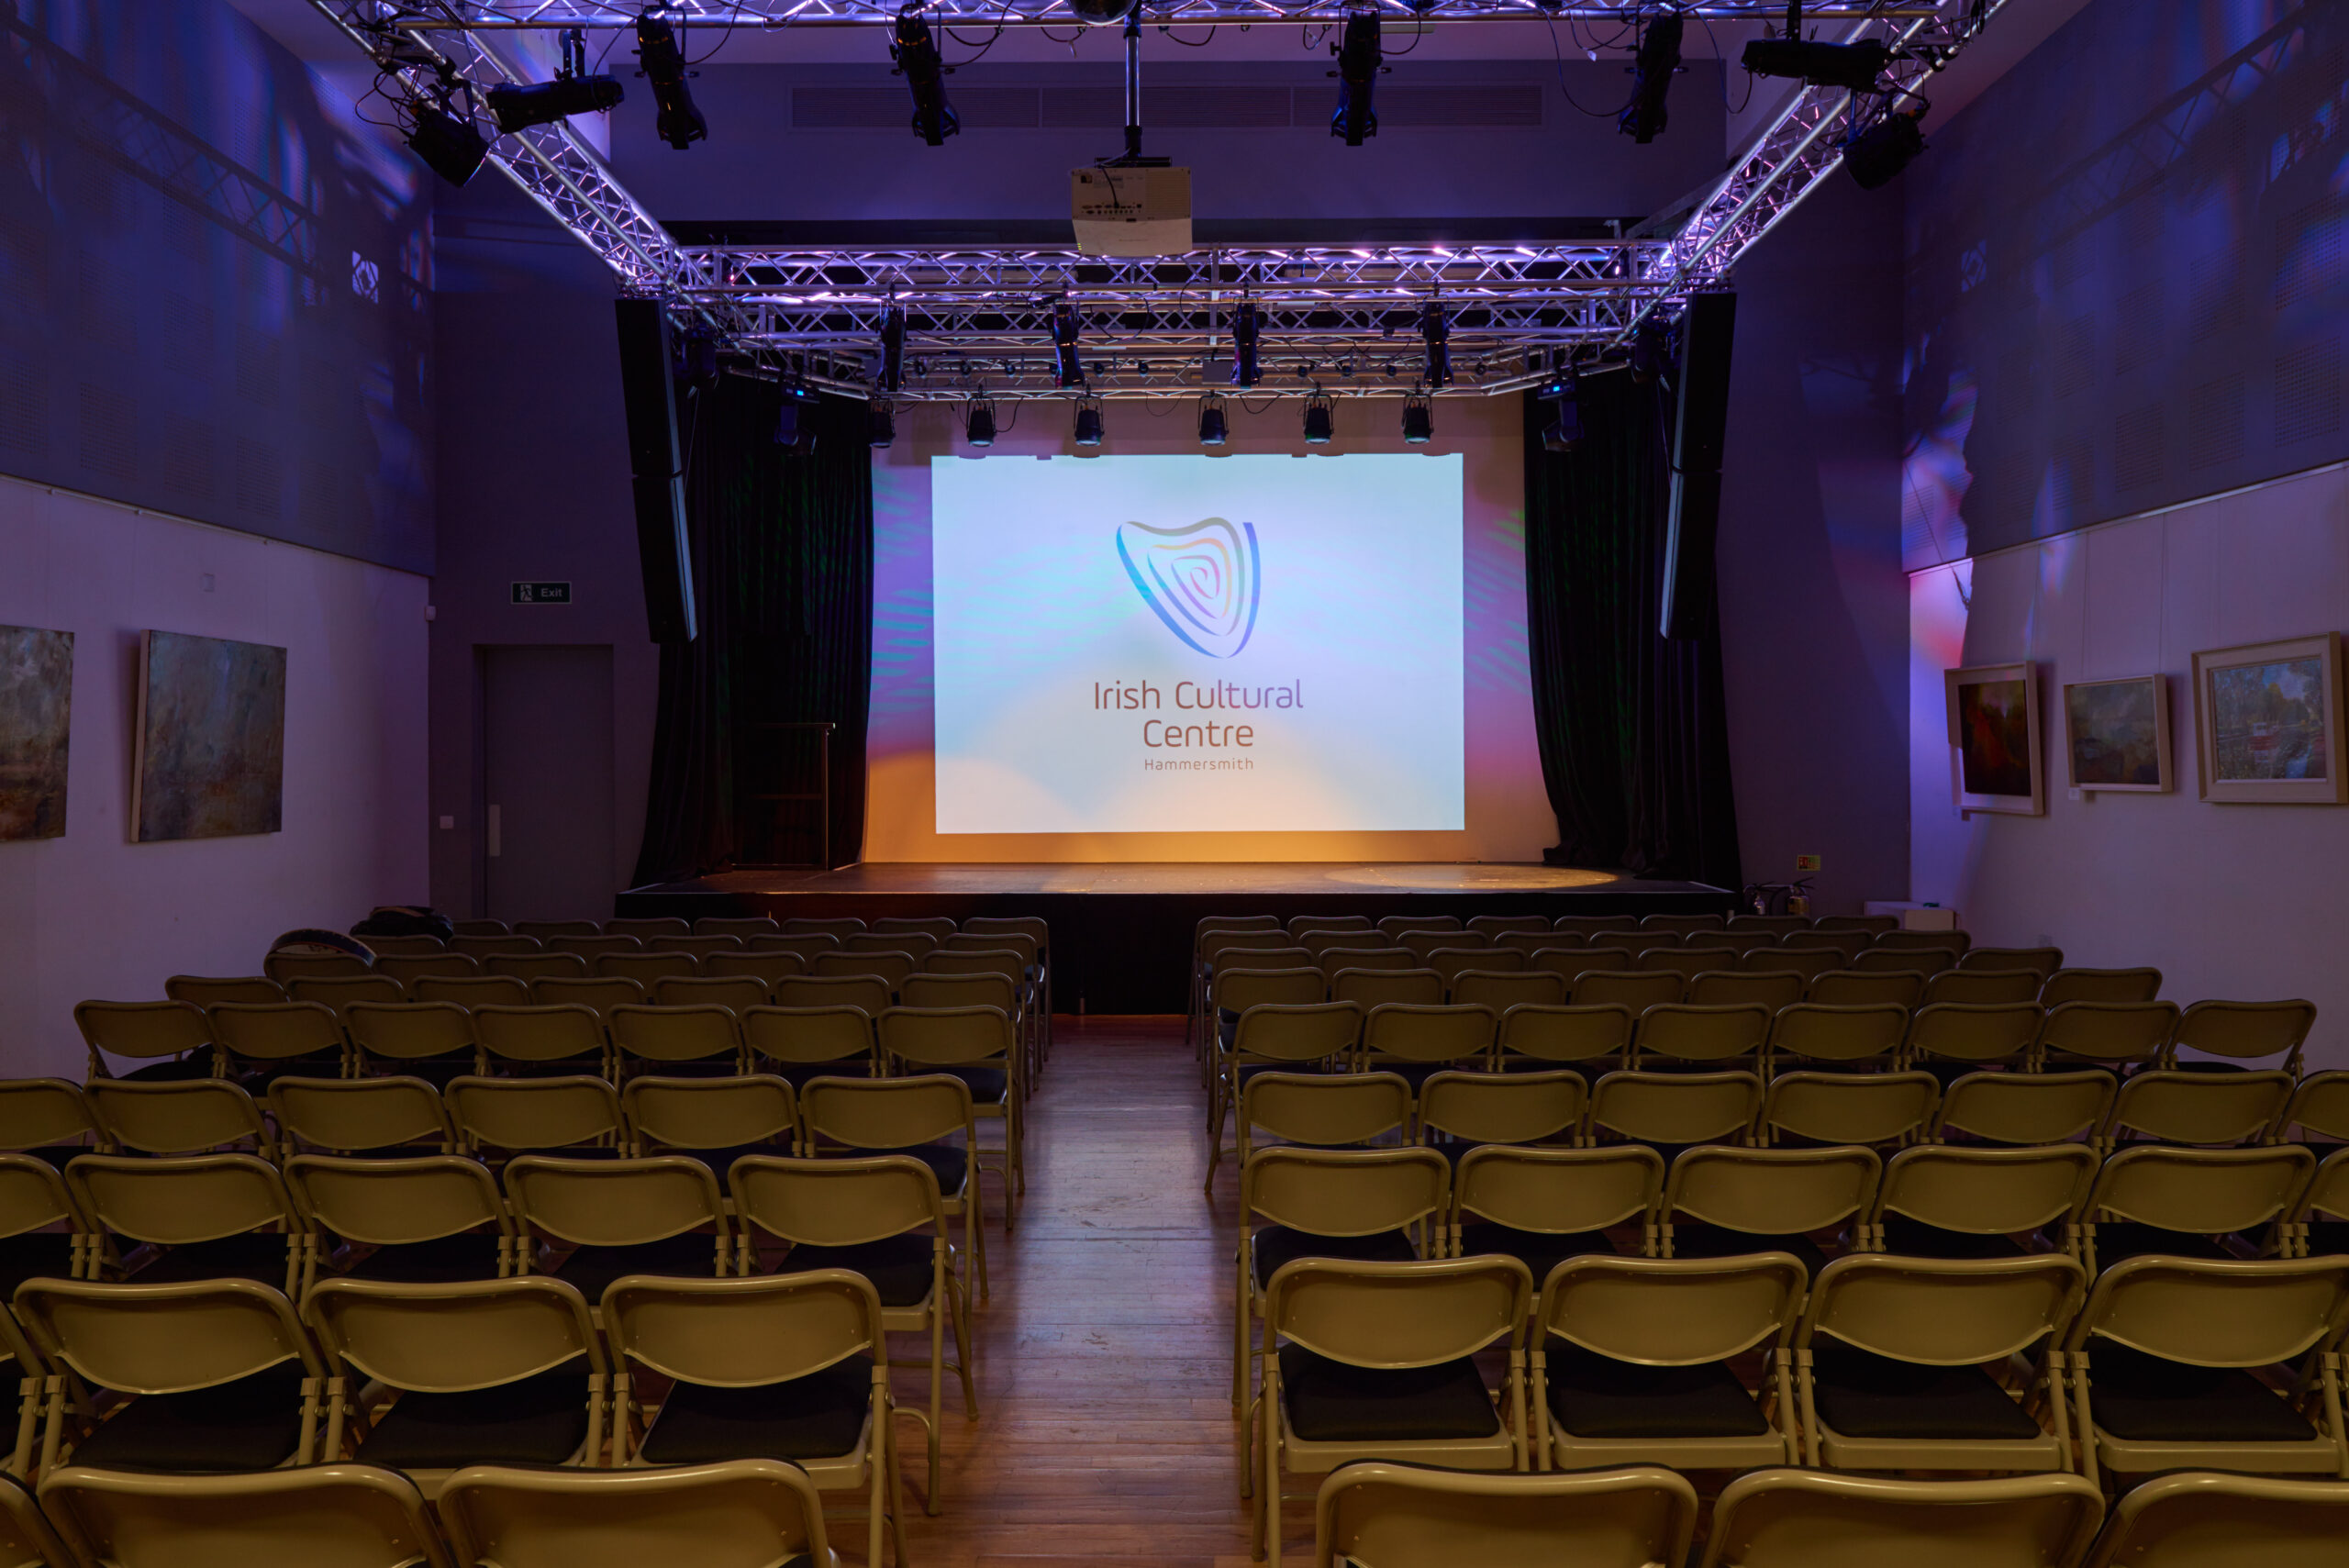 Irish Cultural Centre sponsorship meeting hall.